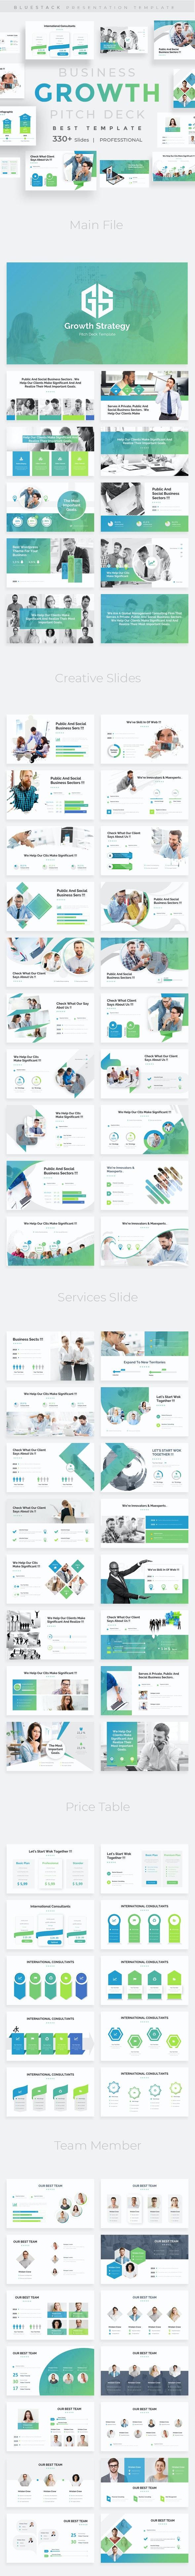 Growth Strategy Pitch Deck Google Slide Template - Google Slides Presentation Templates